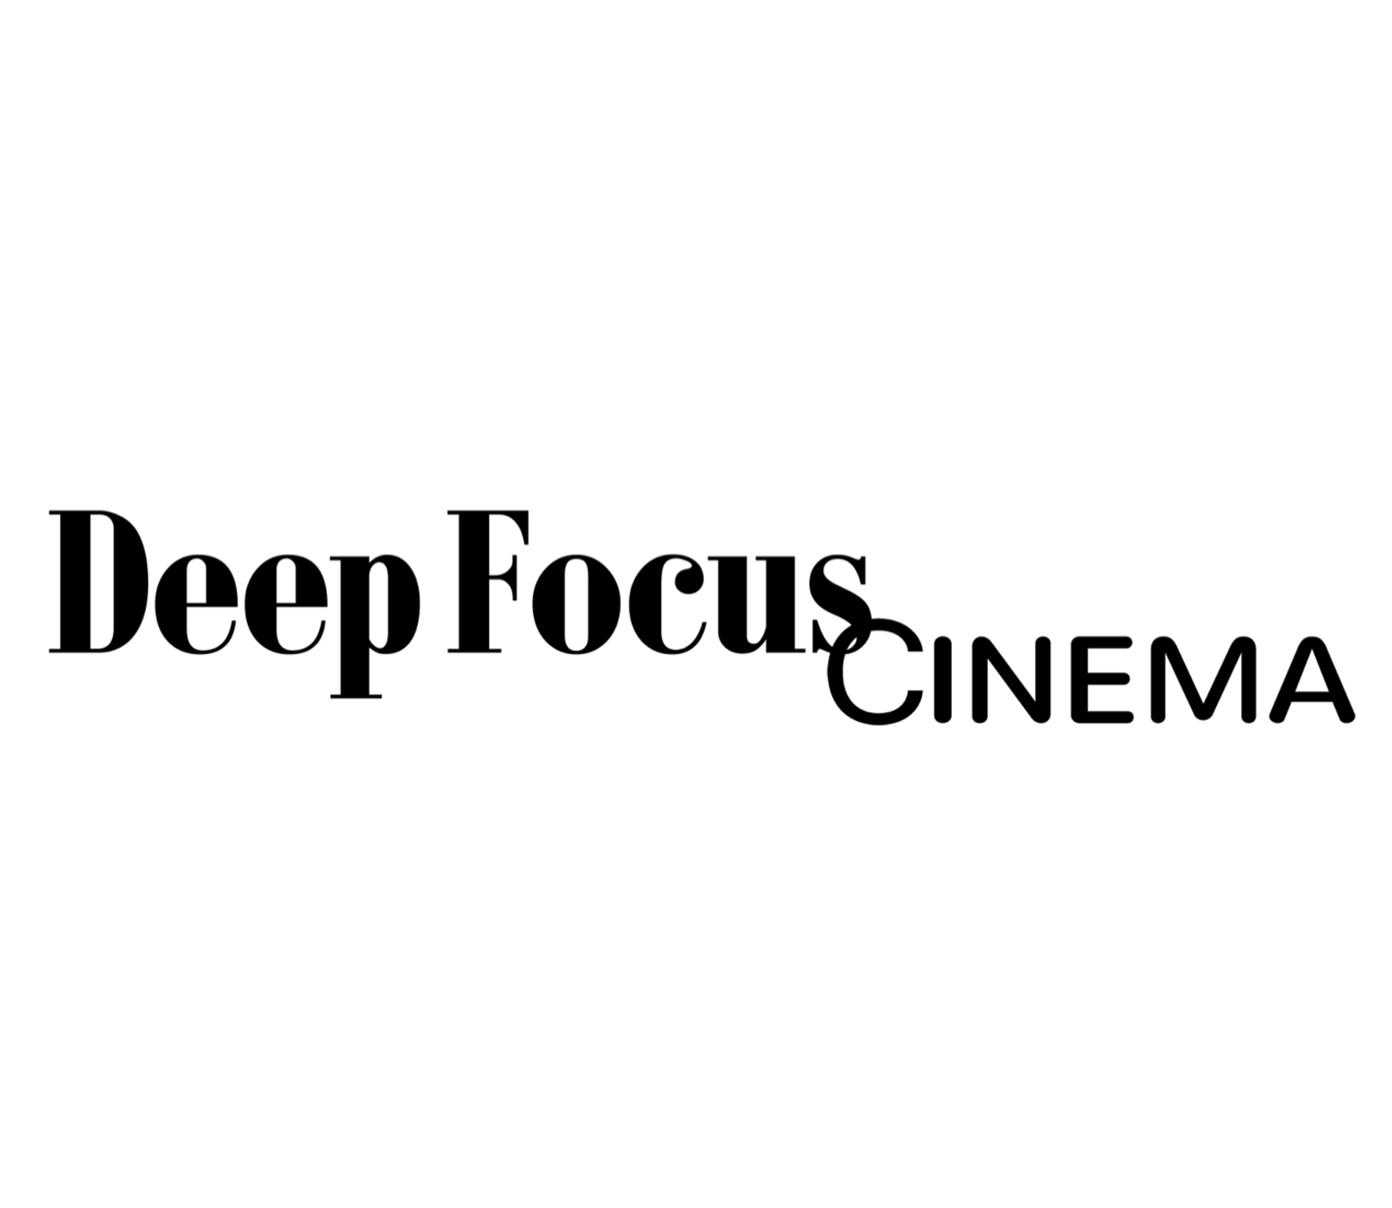 deep focus cinema.jpg